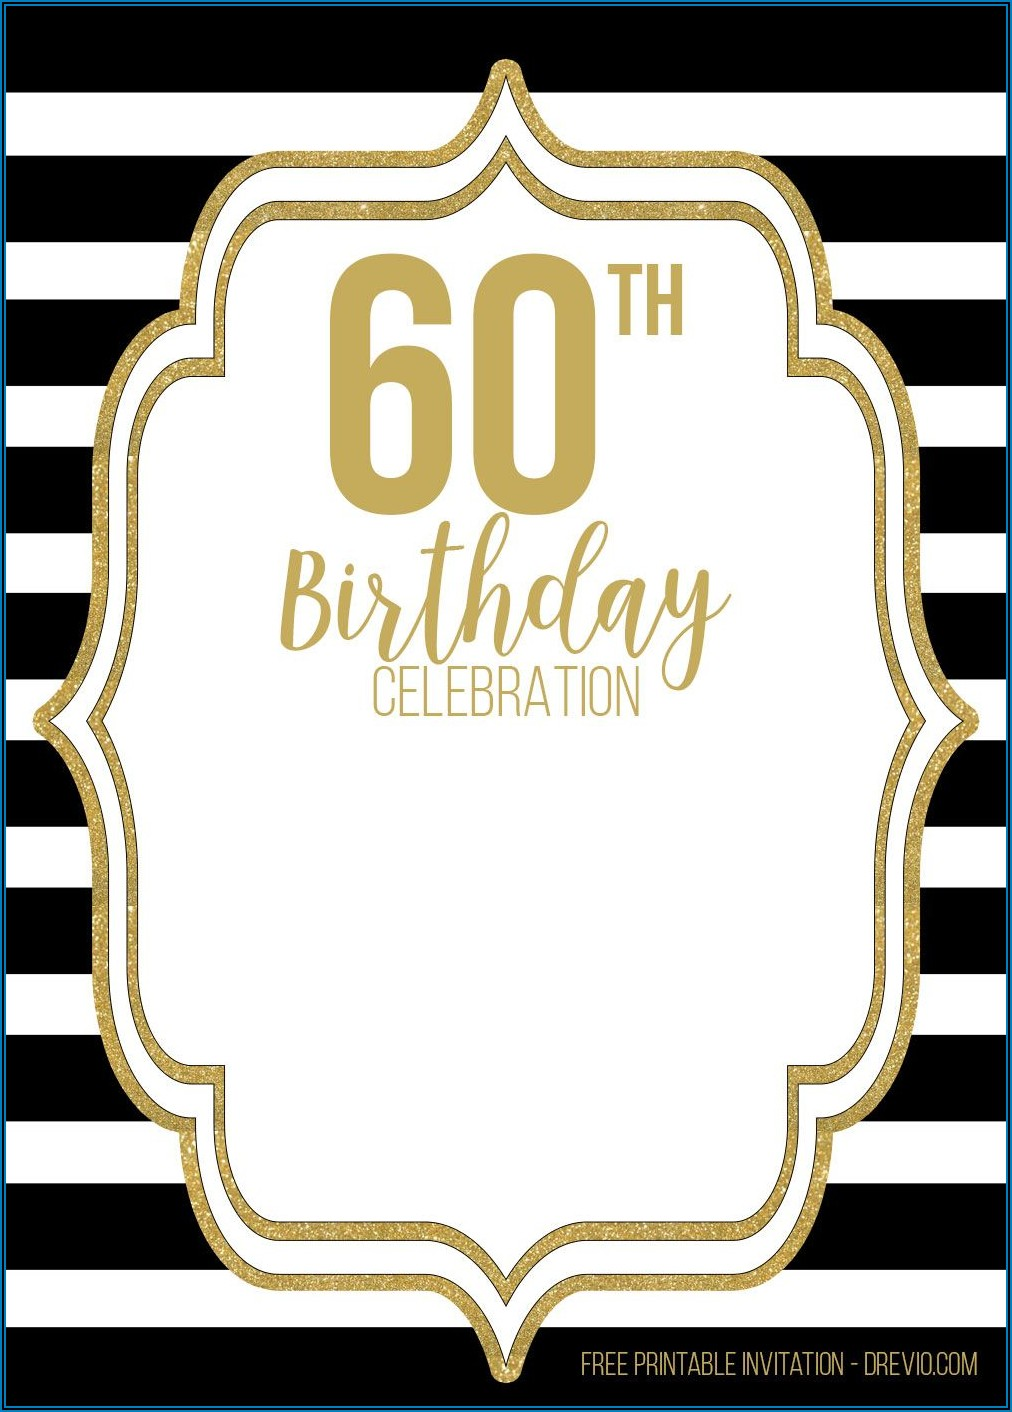 Downloadable 60th Birthday Invitation Templates